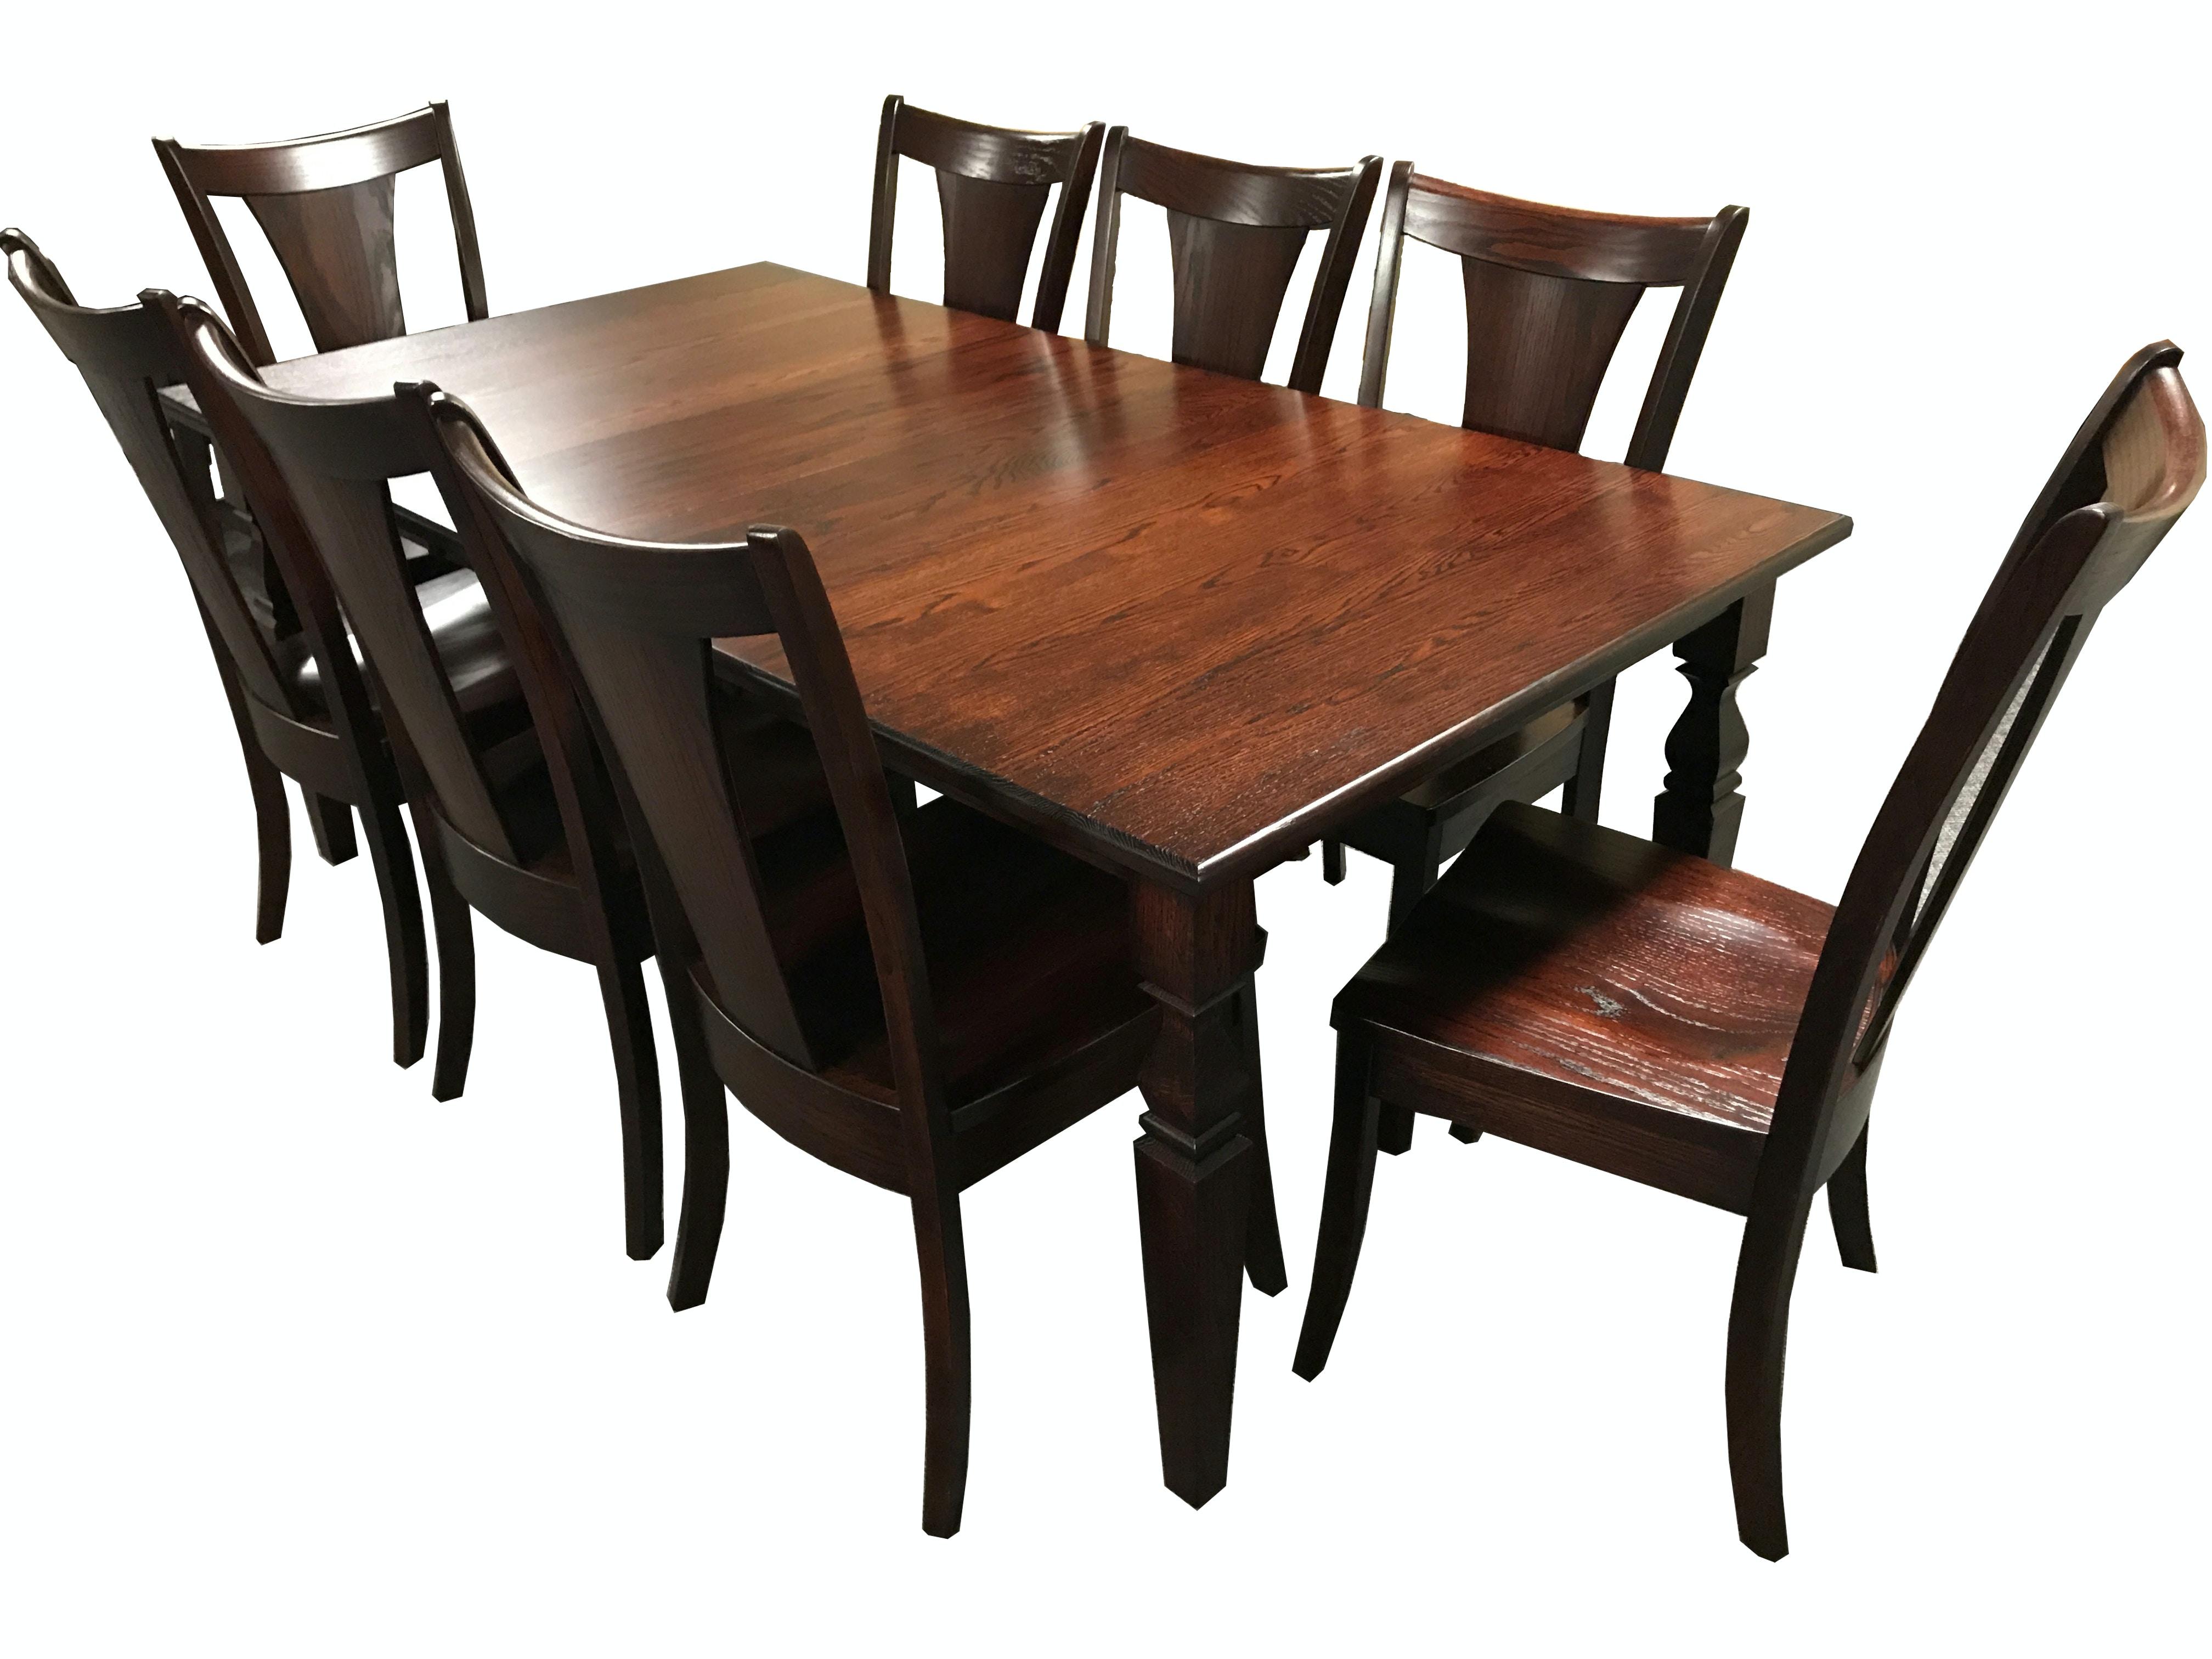 Sunrise Furniture 9 Piece Dining Room Table Set GRB/65